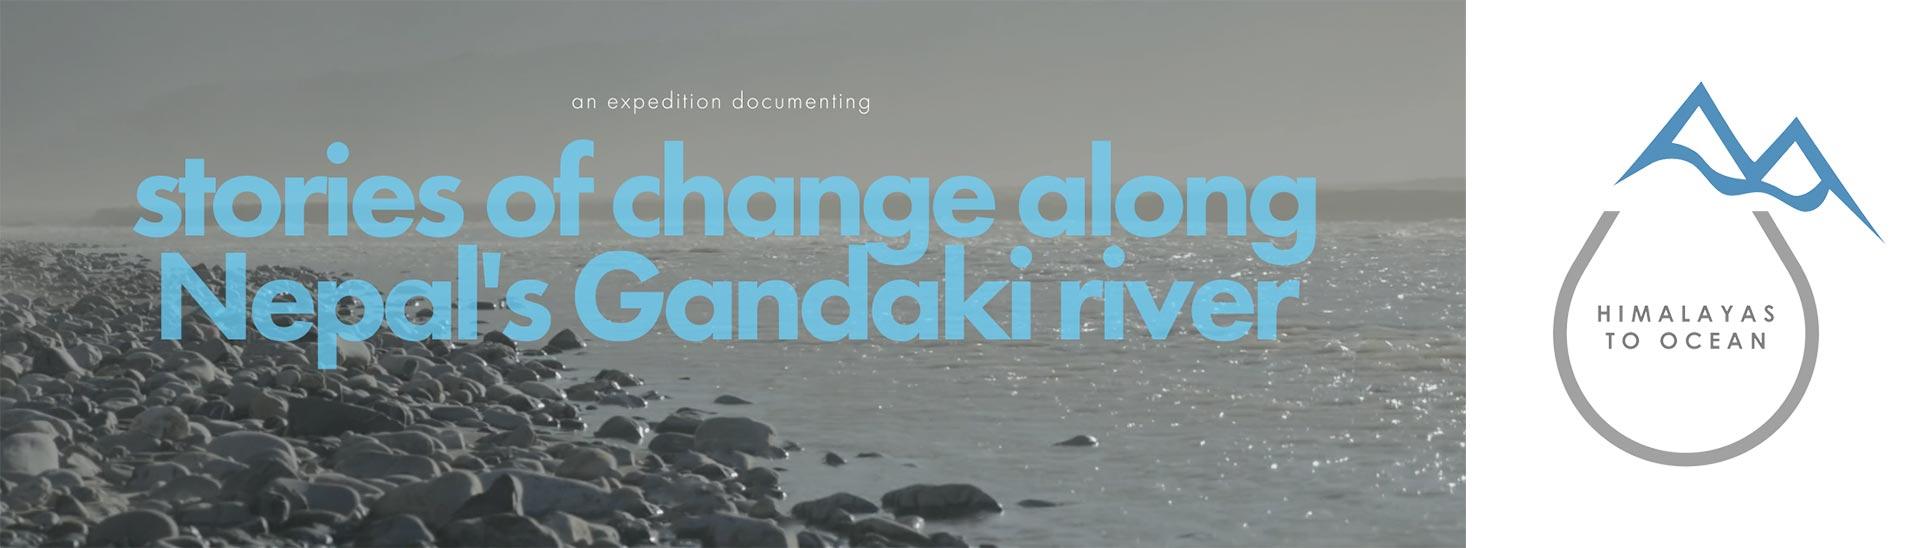 Himalayas to Ocean - Stories of change along Nepal's Gandaki River